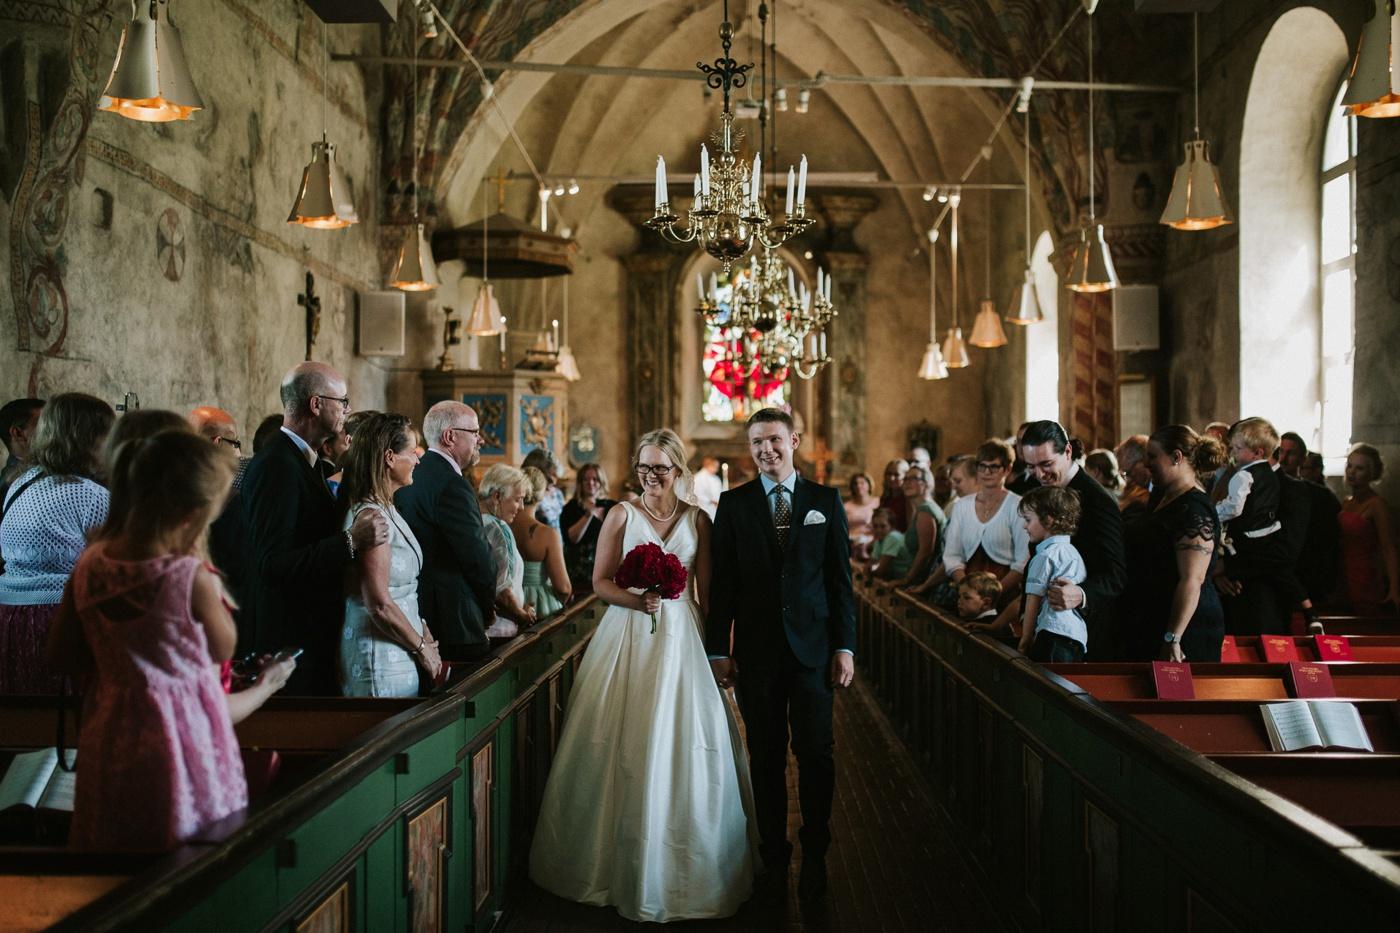 ceciliajoakim_sweden-countryside-summer-wedding_melbourne-fun-quirky-wedding-photography_21